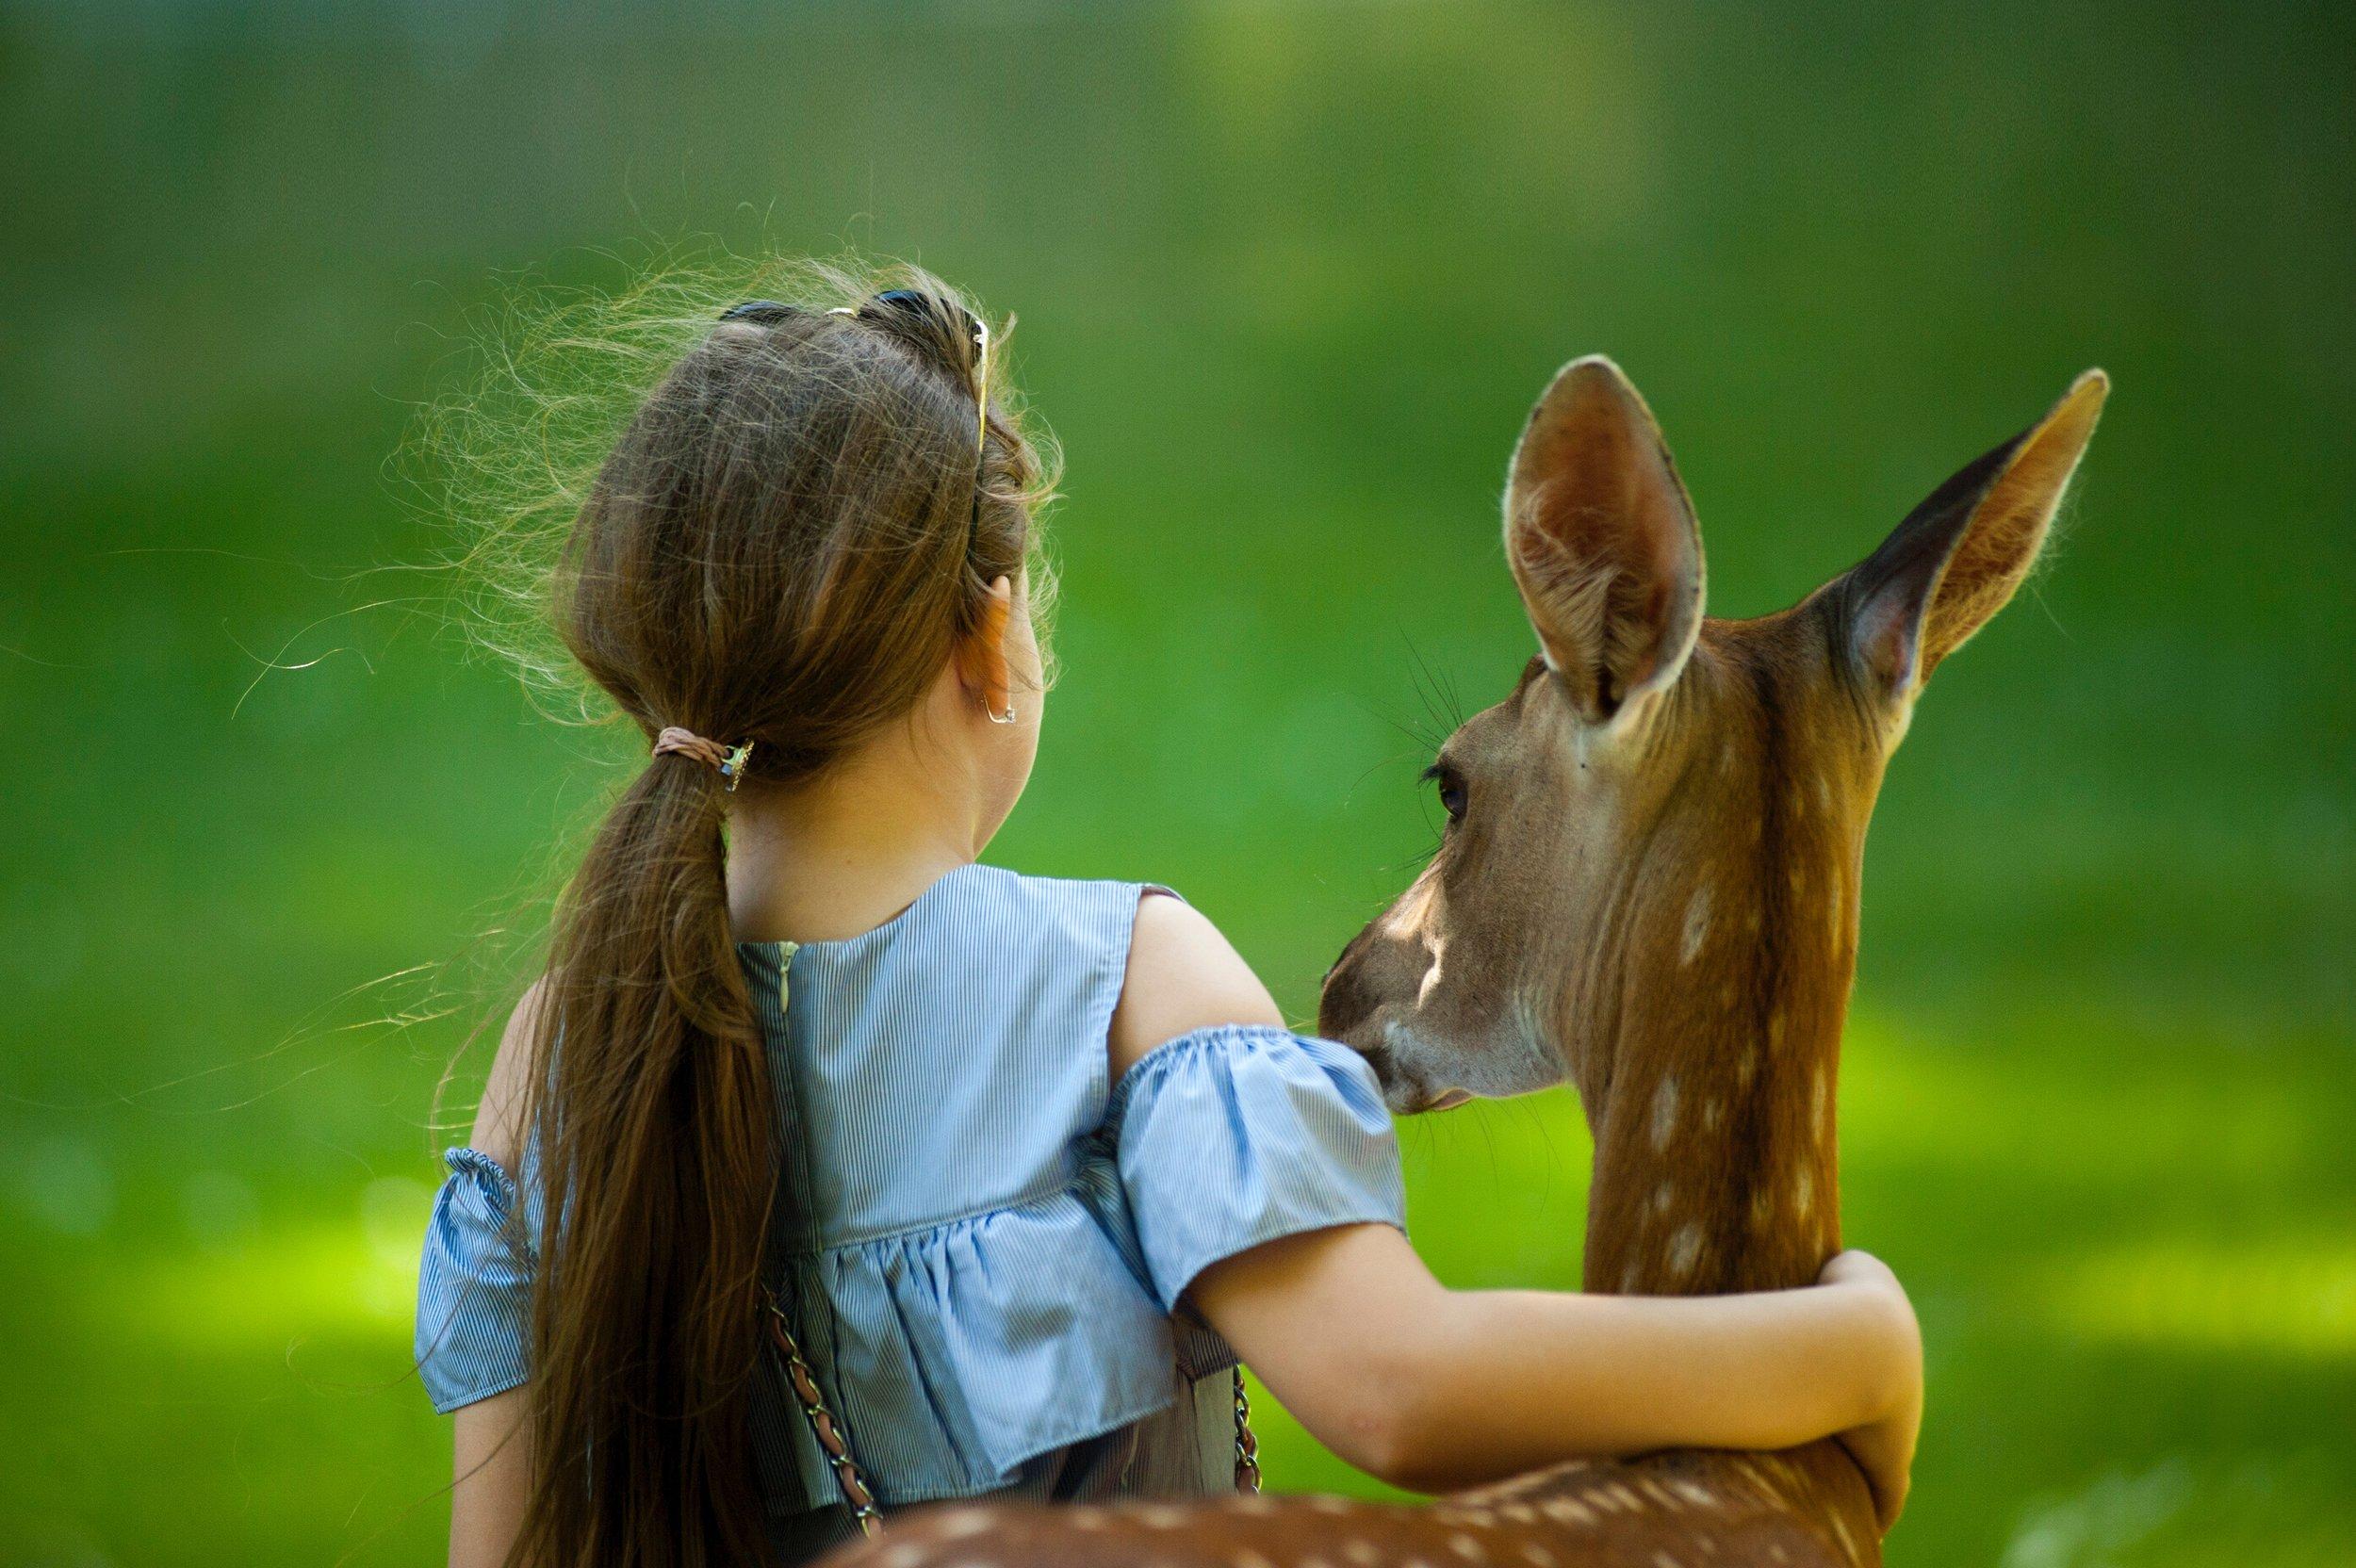 adorable-animal-vegan-life.jpg